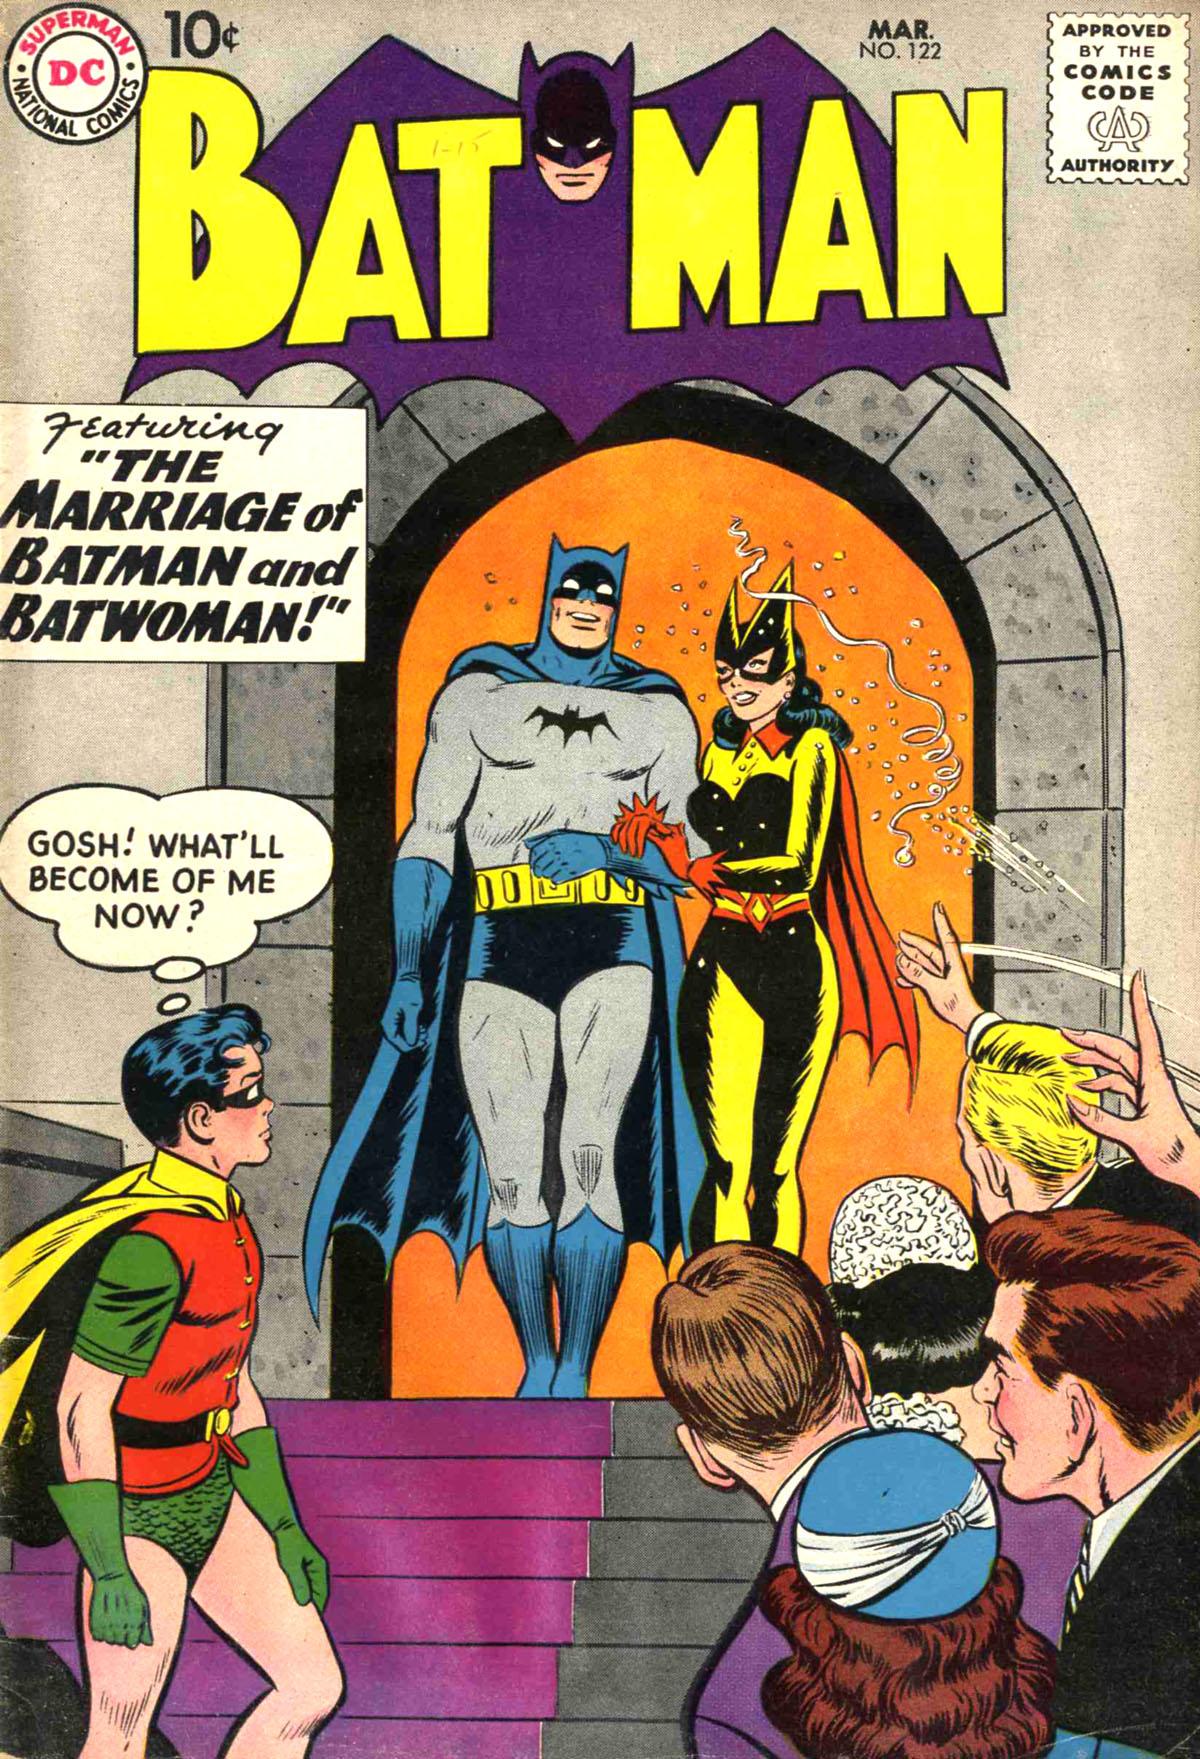 Guy starkman wedding